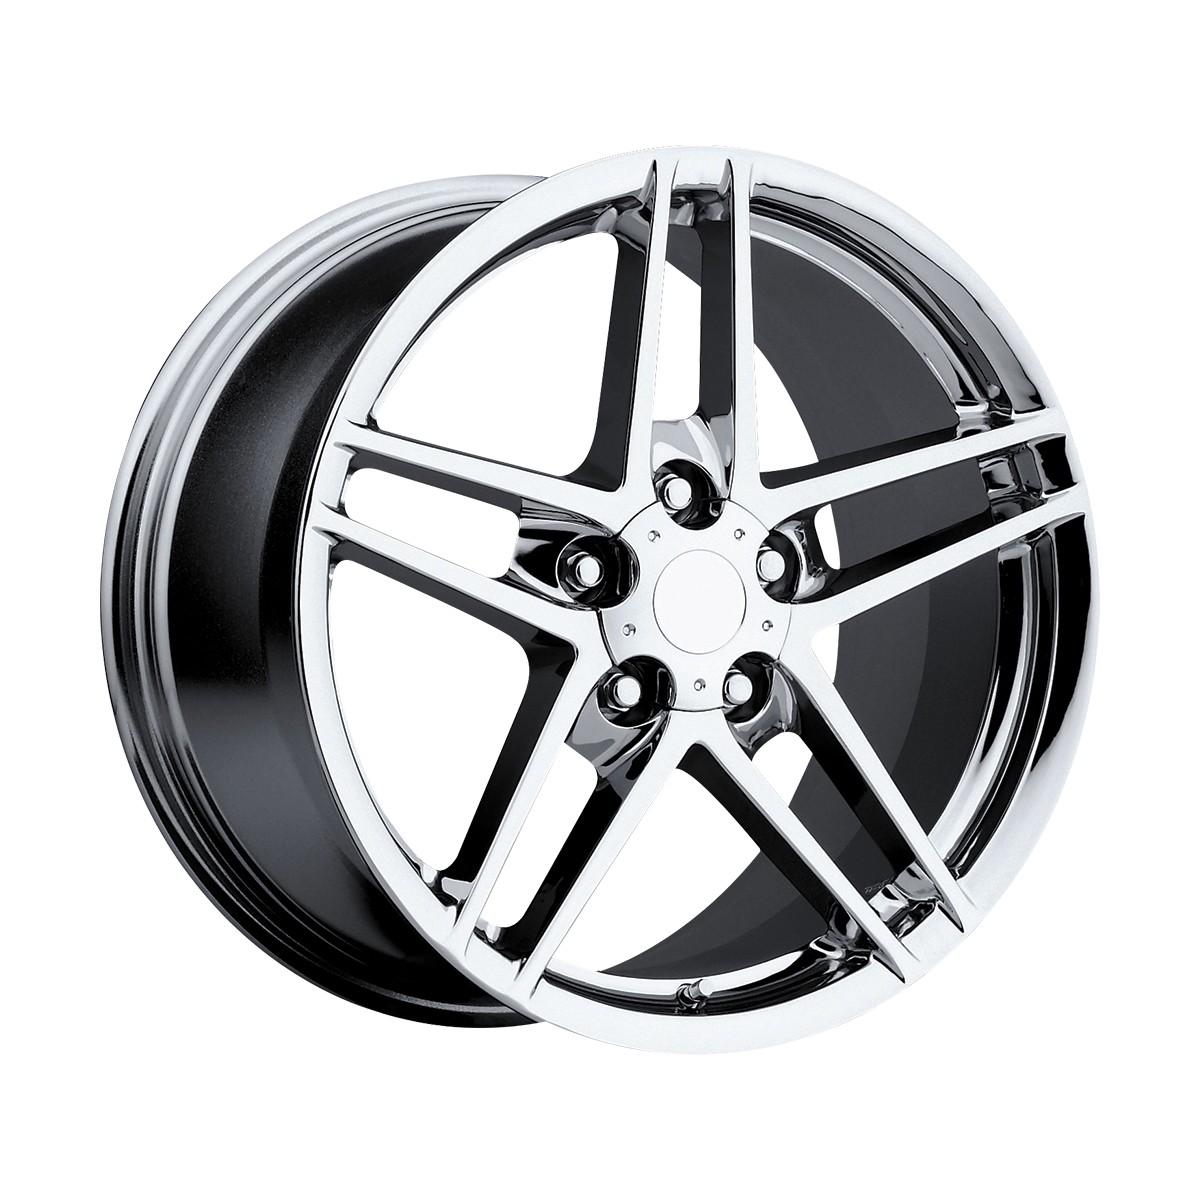 1200x1200 z06 reproduction wheels